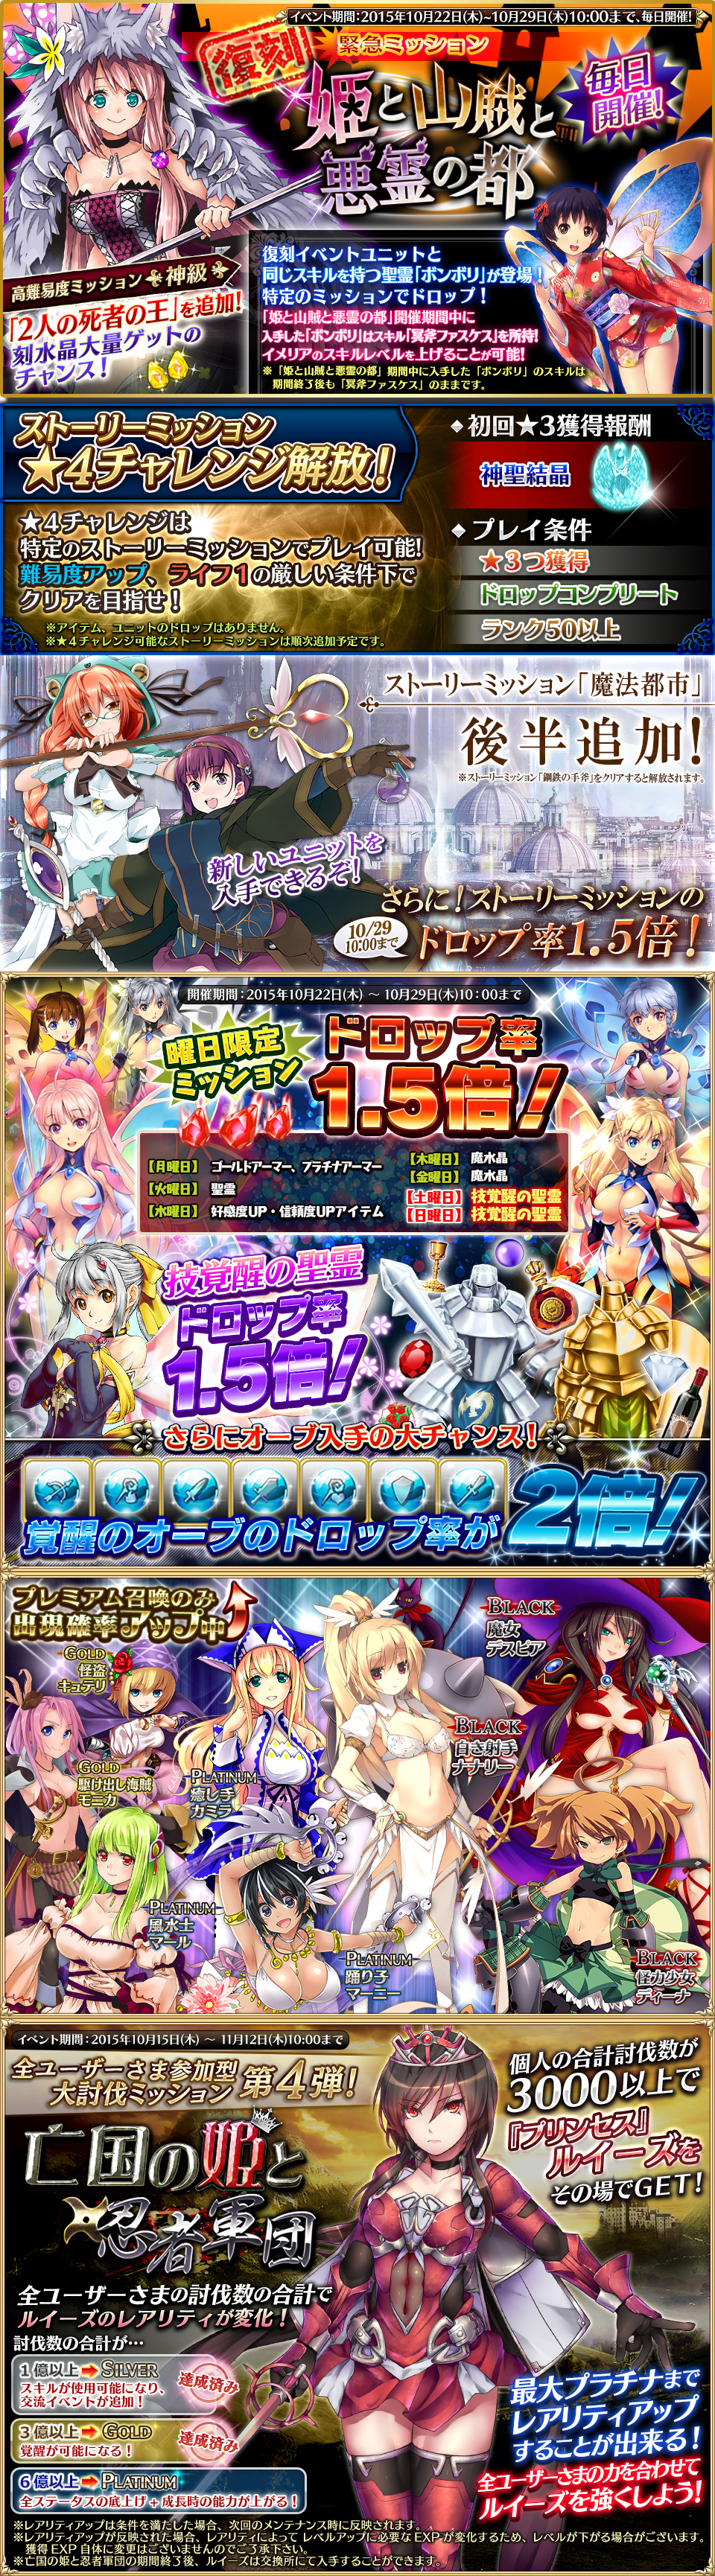 event20151022.jpg